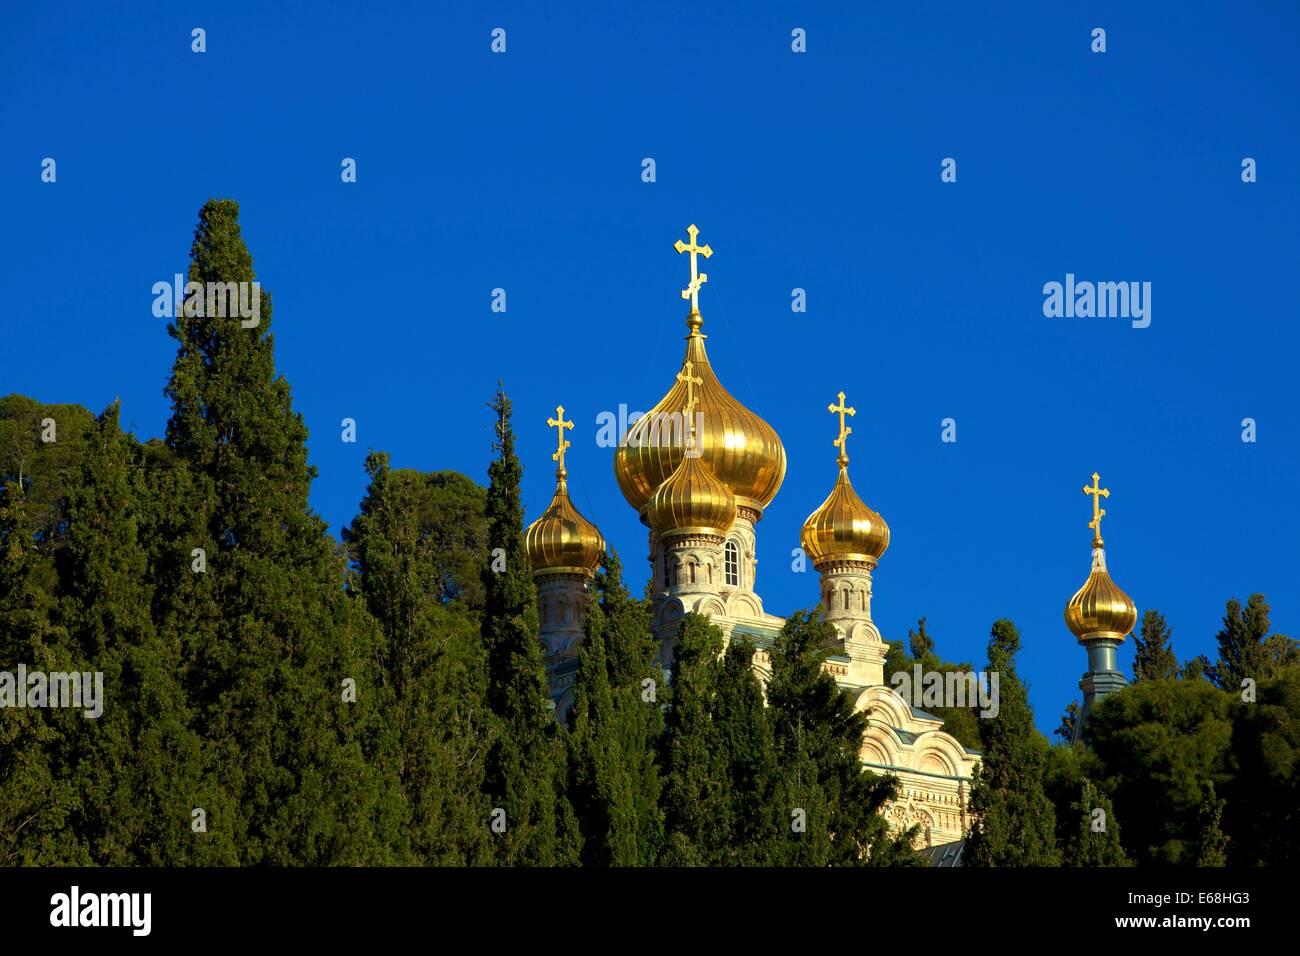 Church Of St. Mary Magdelene, Mount Of Olives, Jerusalem, Israel, Middle East - Stock Image